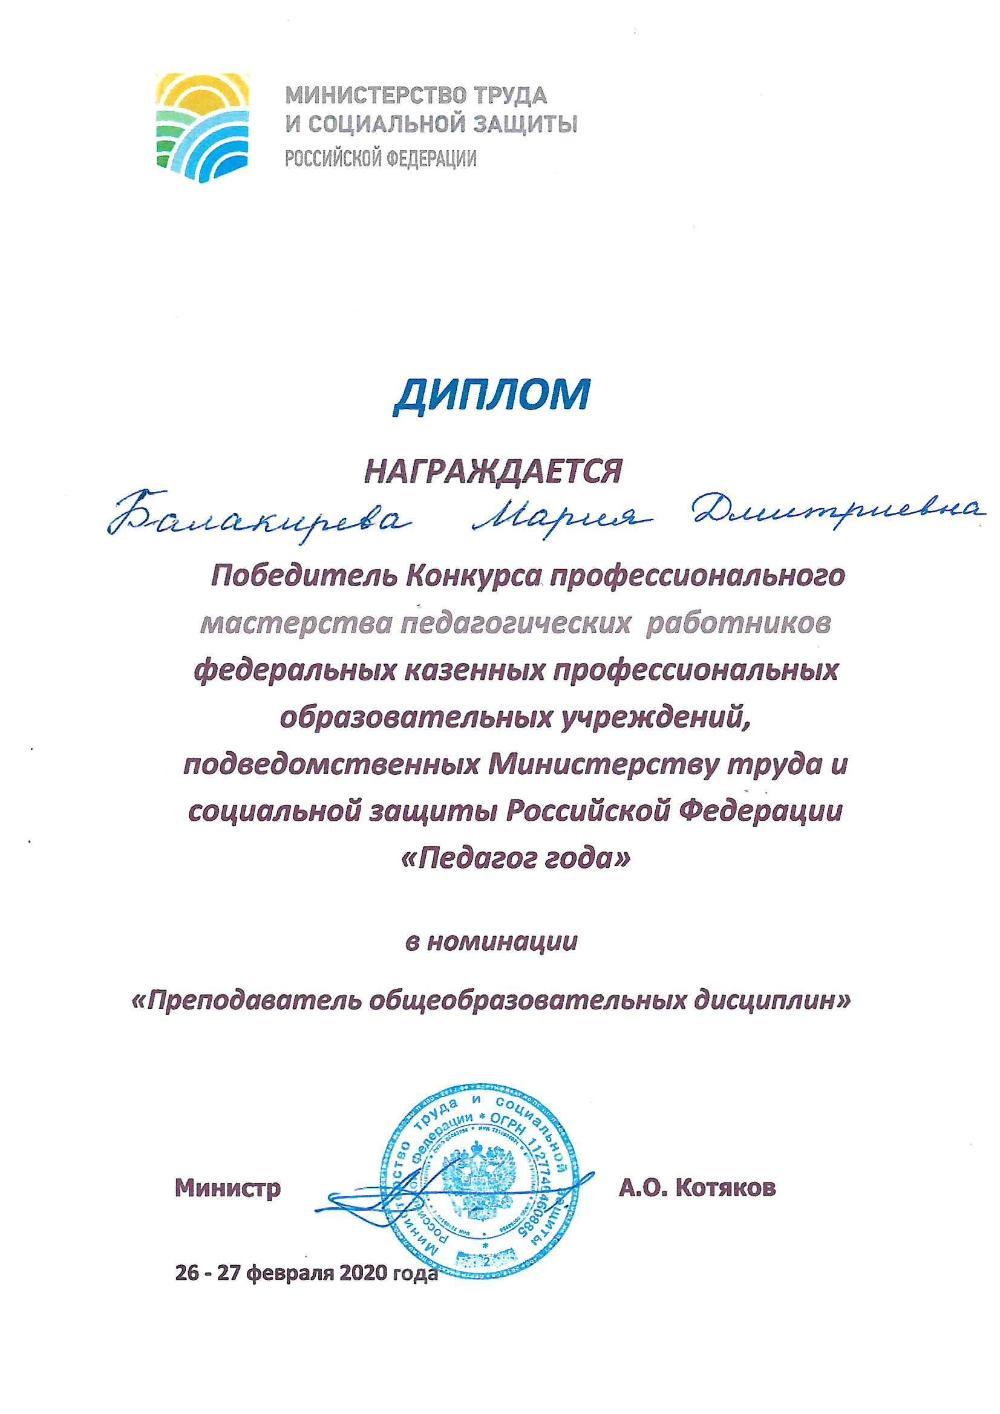 Балакирева-диплом-1-место-конкурс-Педагого-года.jpg